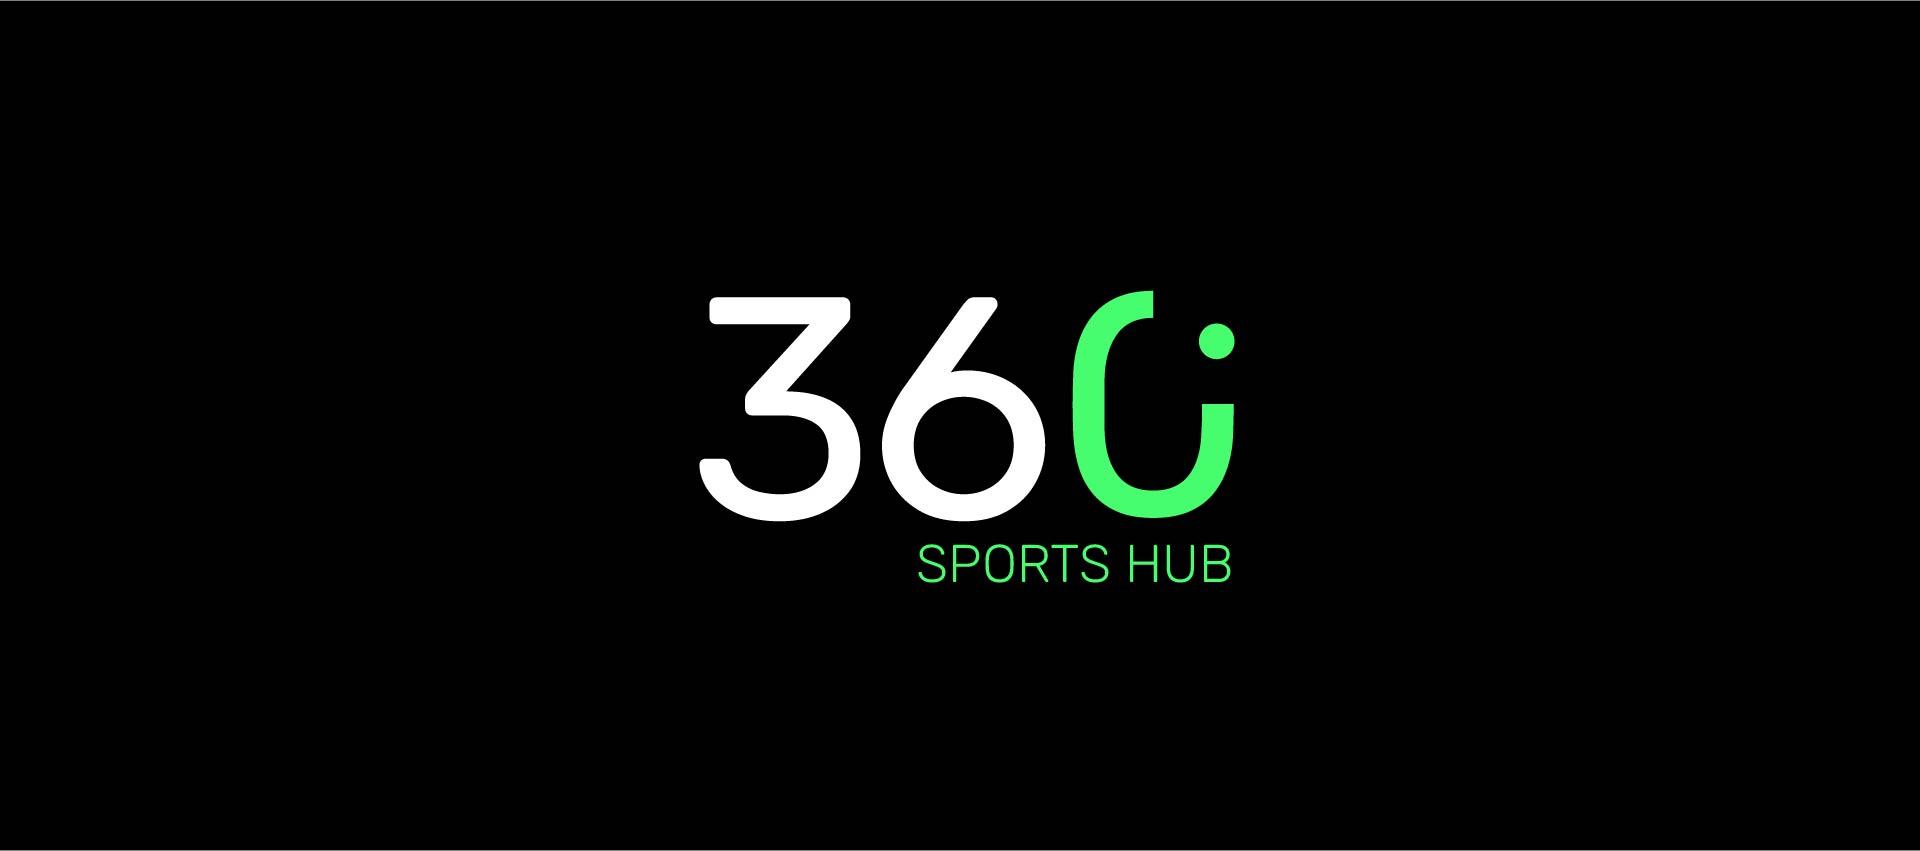 360° Sports Hub black logo